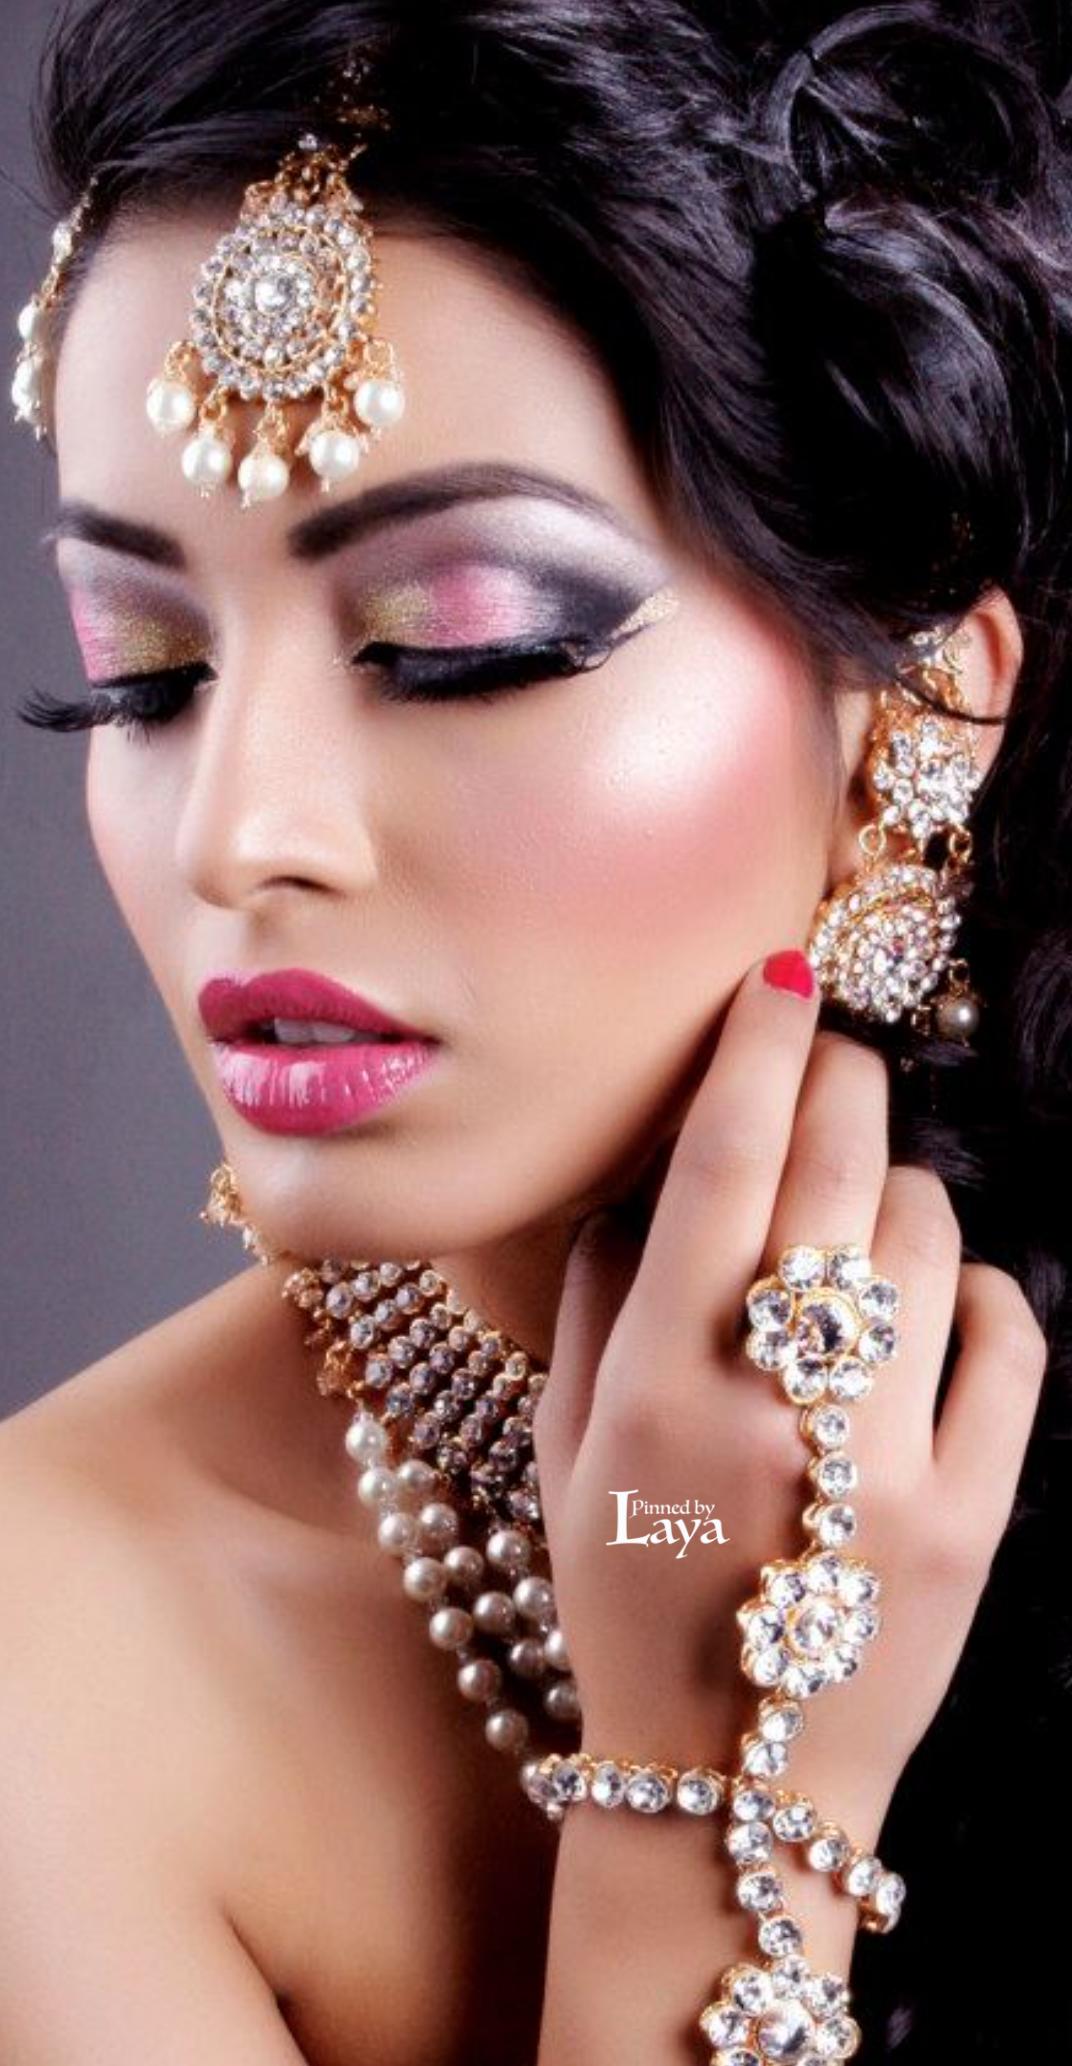 ♔LAYA♔INDIAN BRIDE♔ | Hair & Beauty | Pinterest | Face, Makeup ...